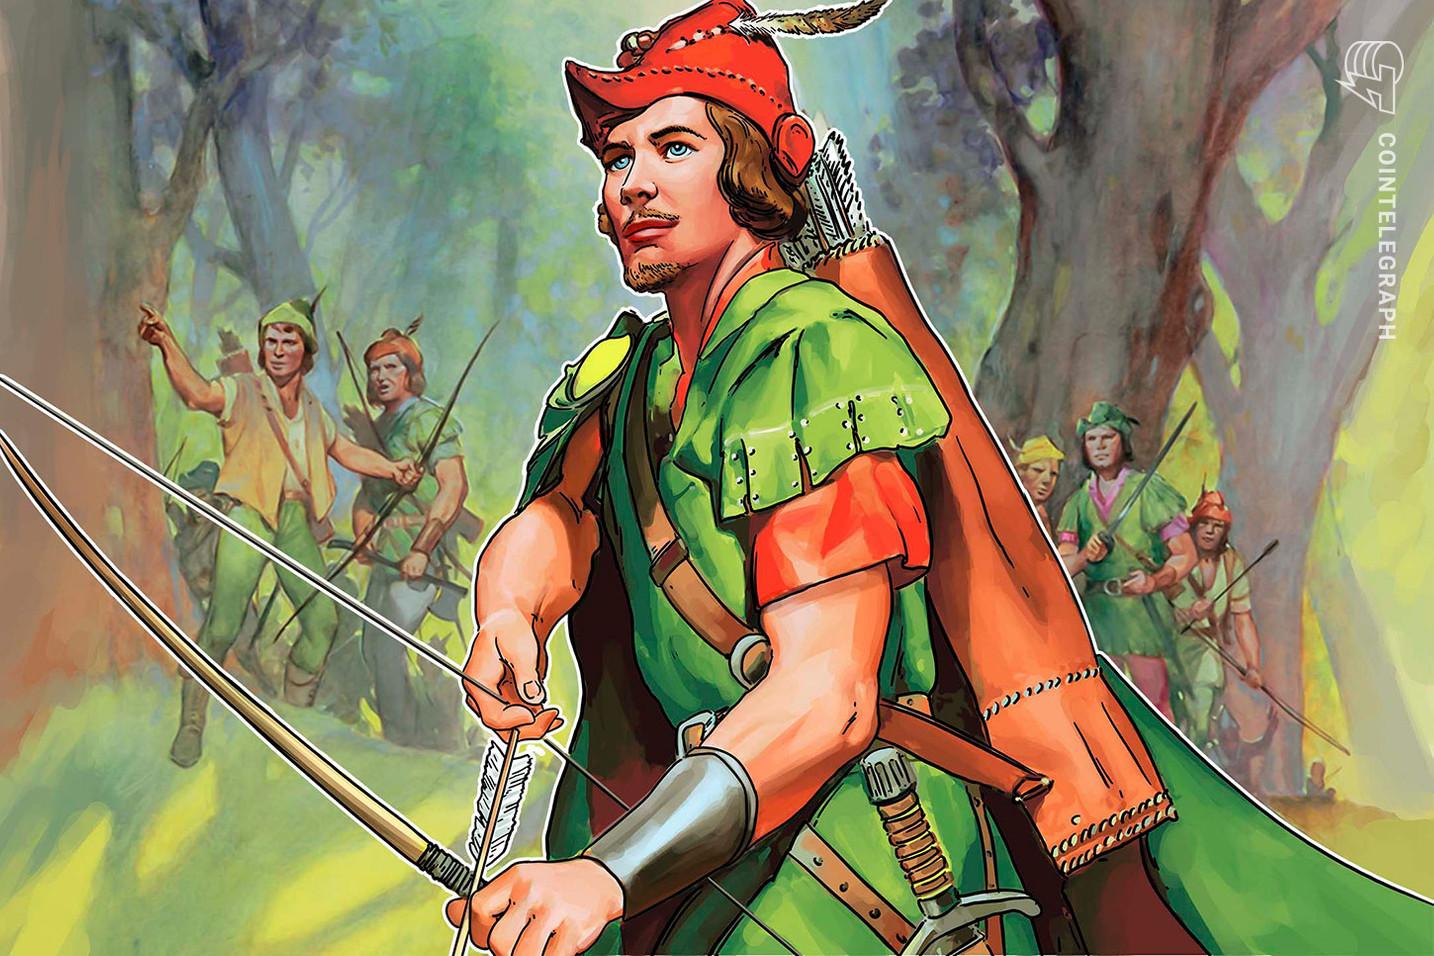 Robinhood warns a crypto revenue drop is coming amid IPO filing